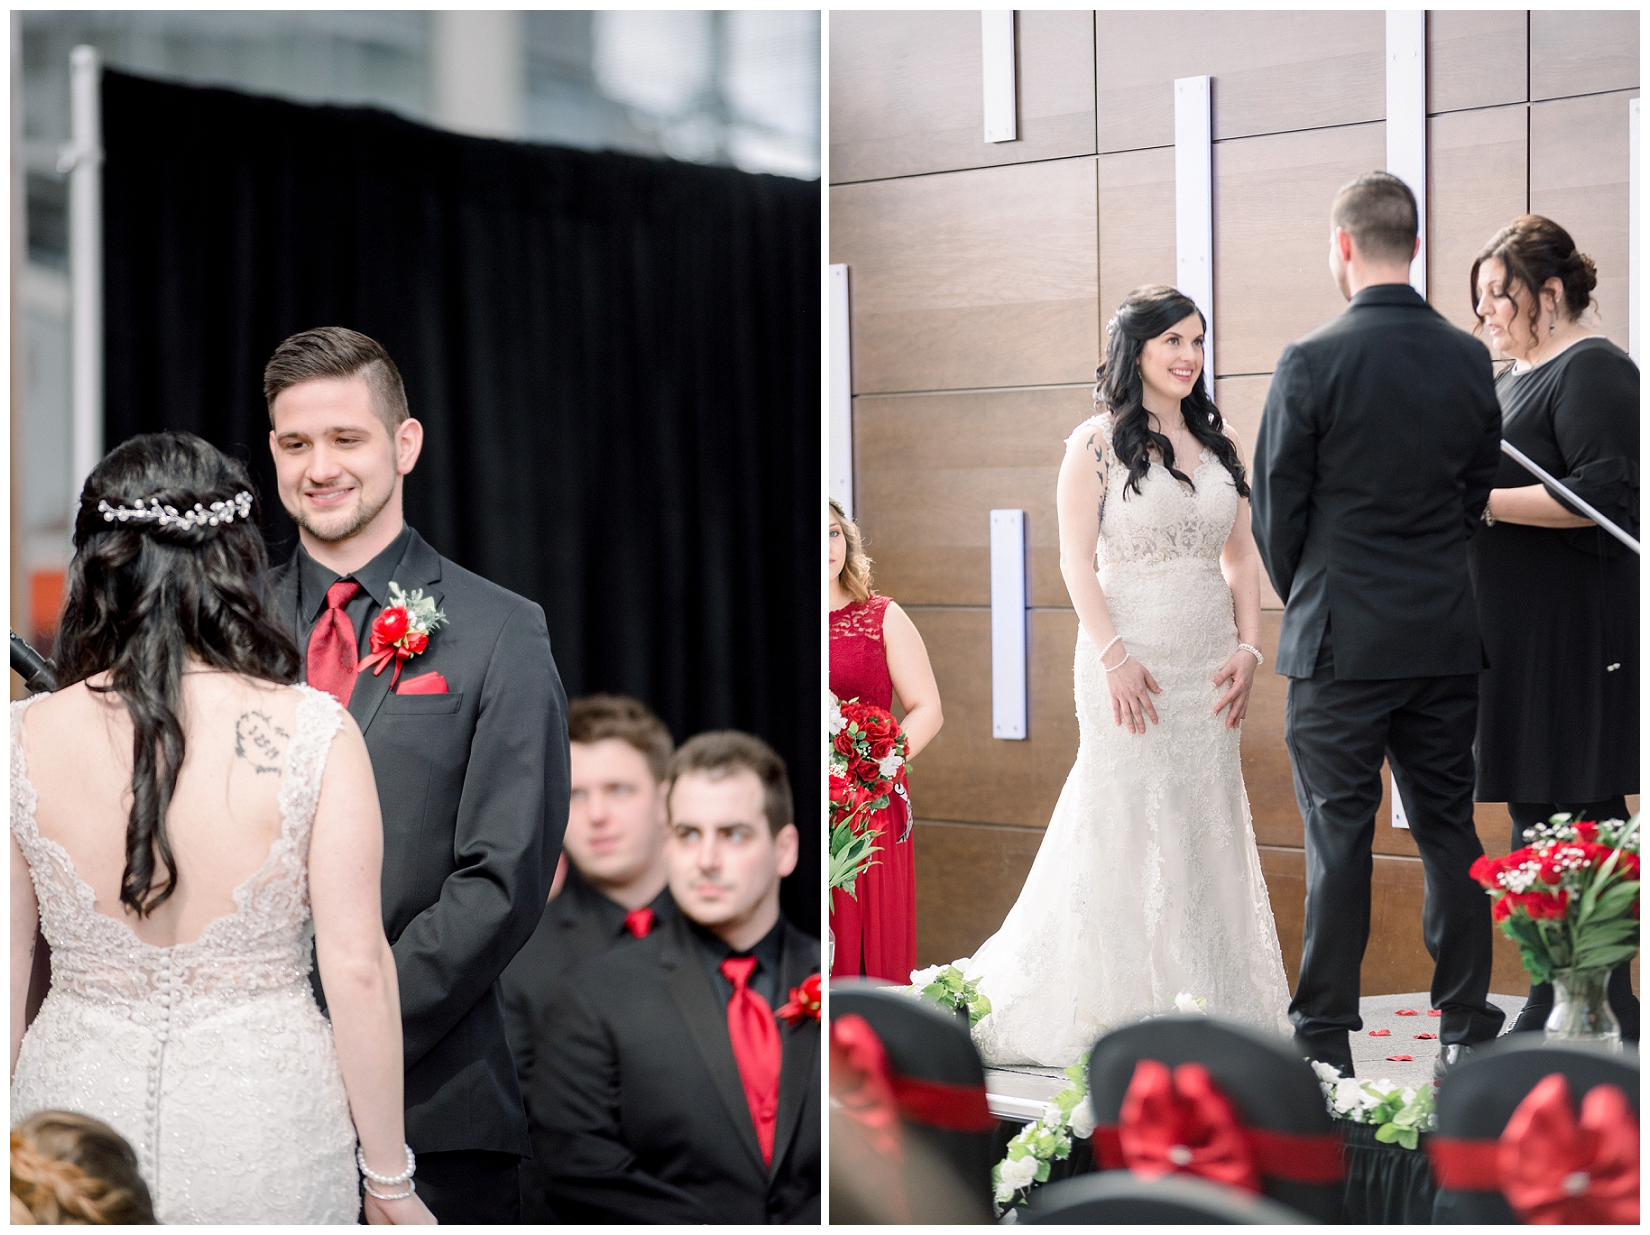 cat-alkire-wedding-photographer-indiana-chicago-indianapolis-fort-wayne_1084.jpg